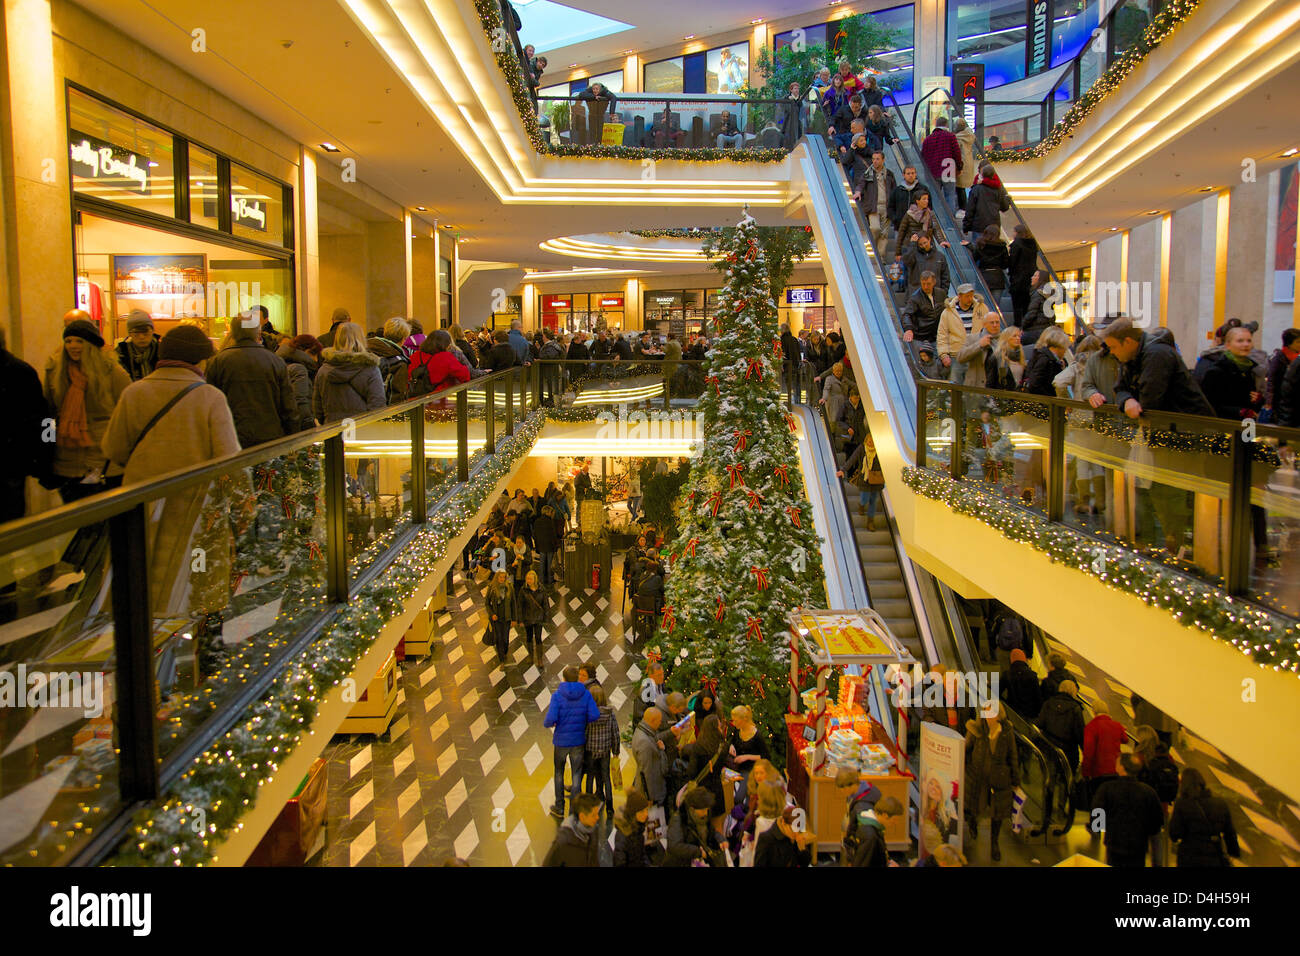 Saturn Shopping Centre at Christmas, Munster, North Rhine-Westphalia, Germany Stock Photo